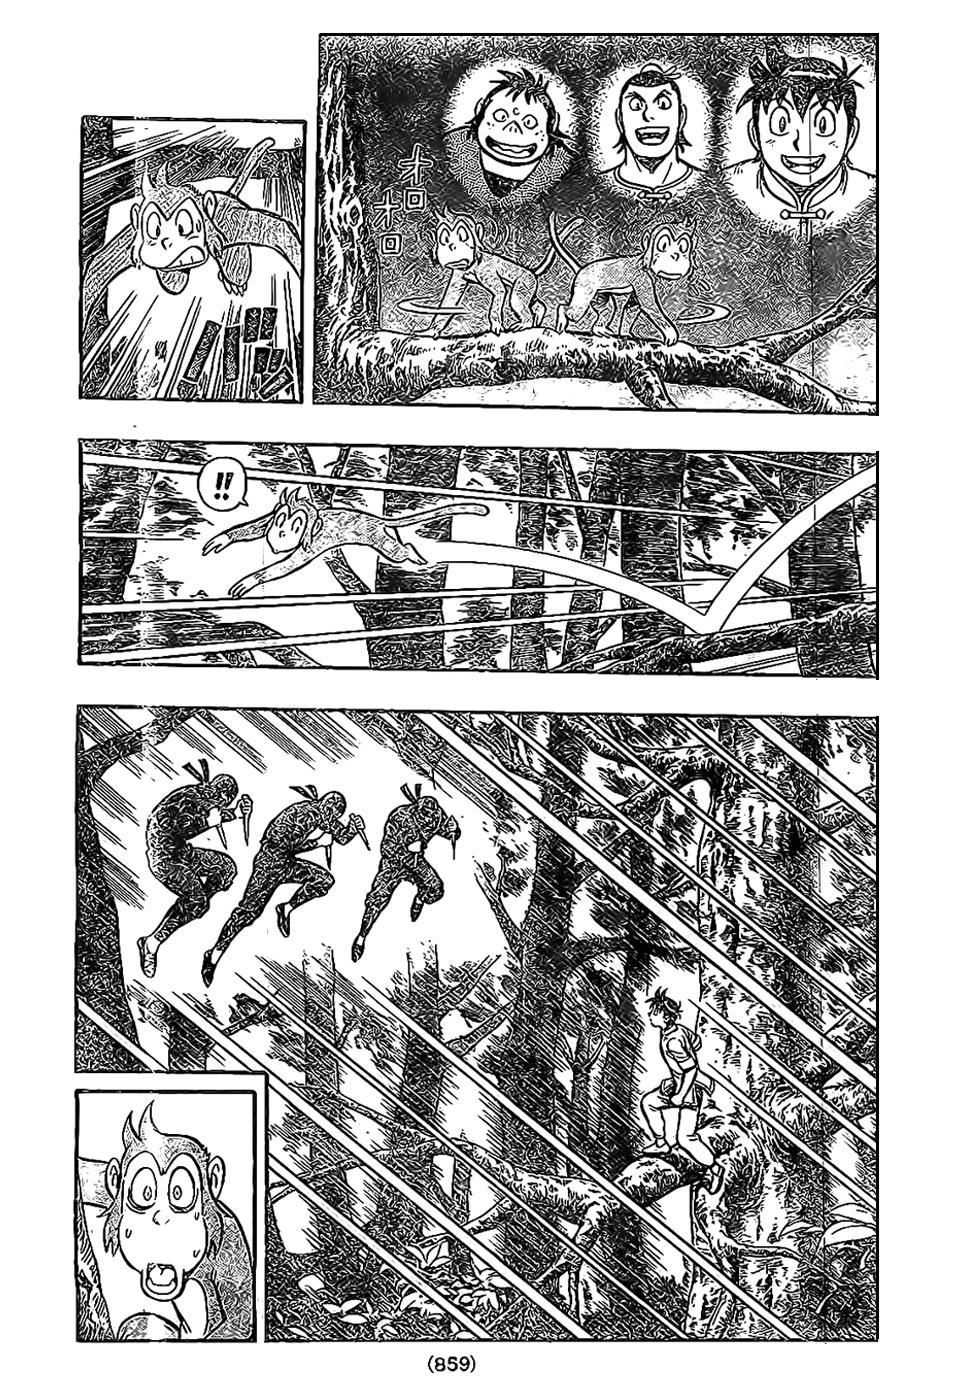 Hoàng Phi Hồng Phần 4 chap 85 Trang 10